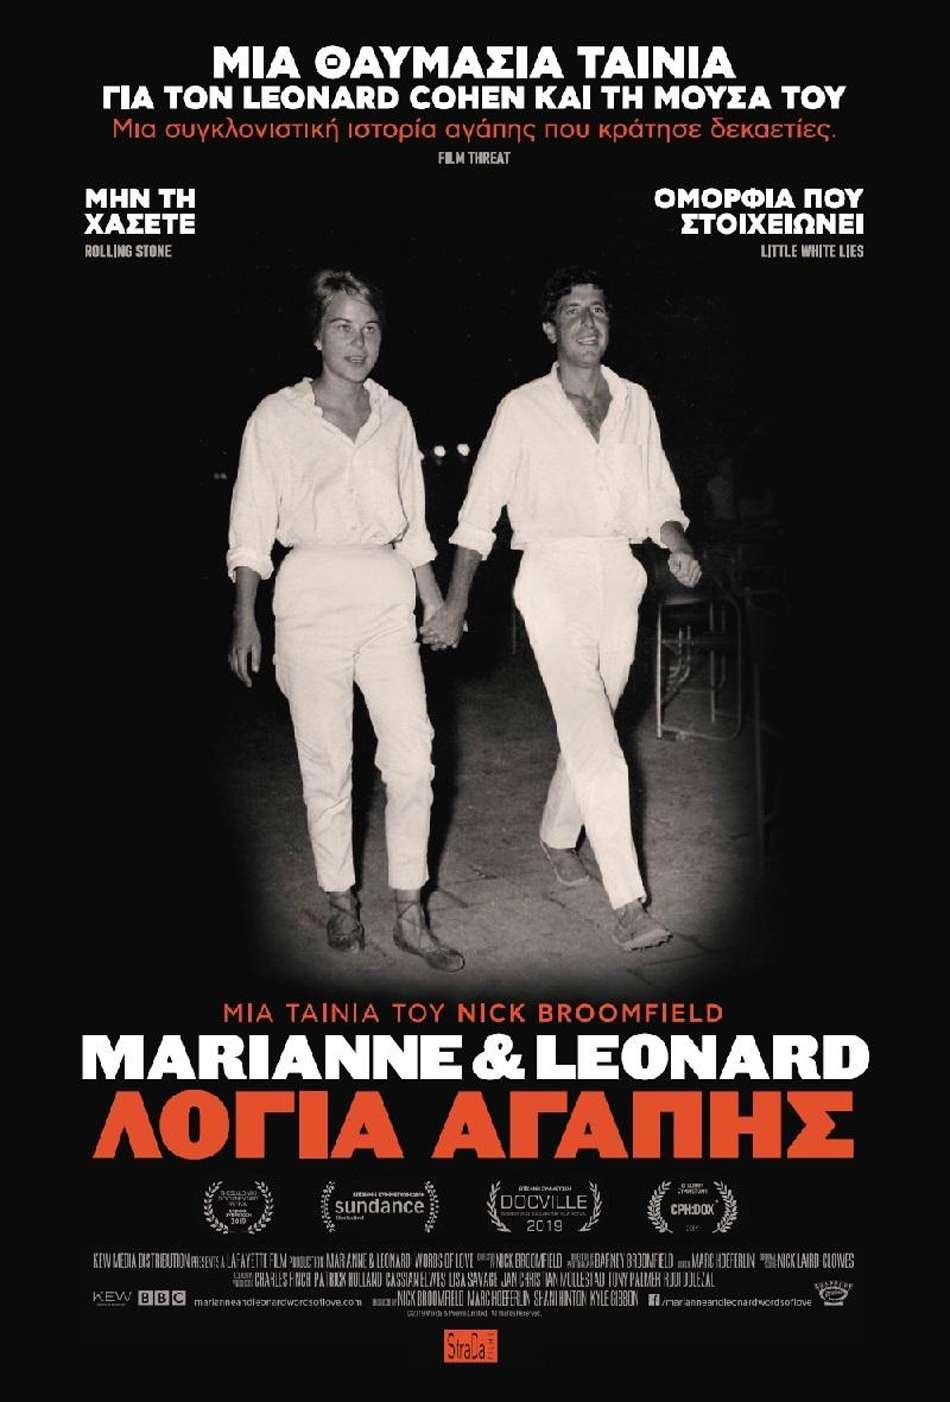 Marianne & Leonard Λόγια Αγάπης (Marianne & Leonard Words of Love) Poster